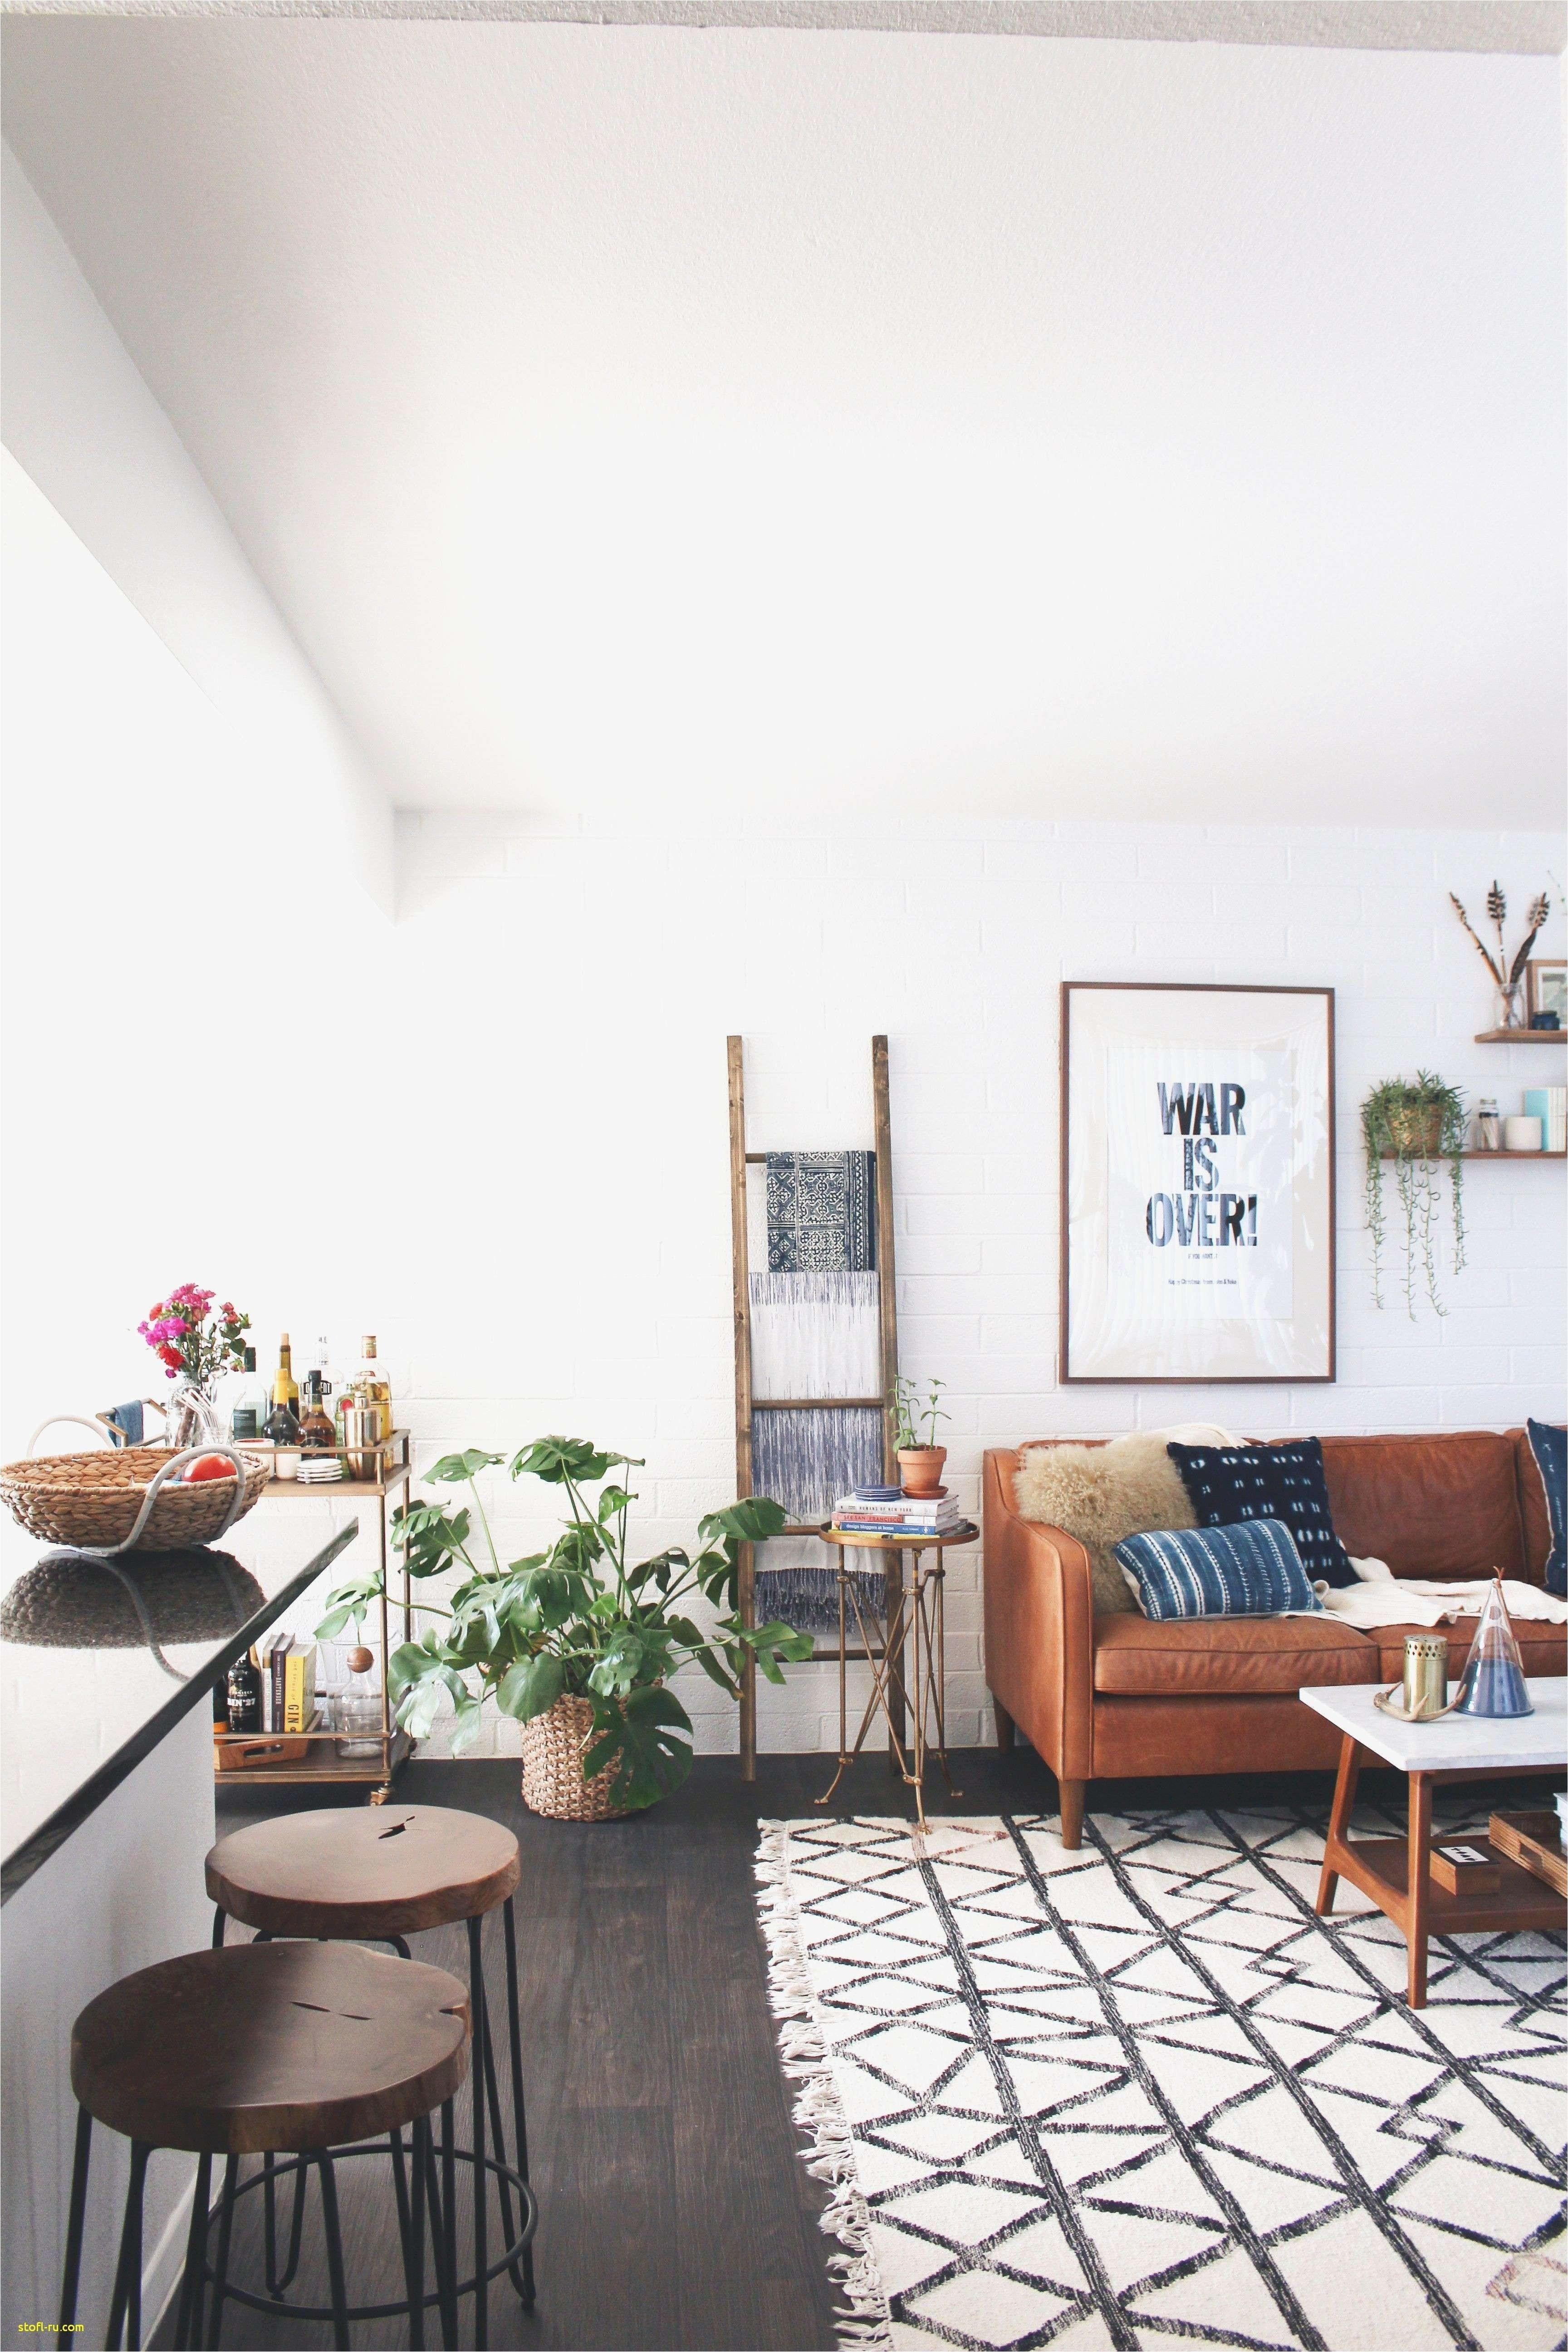 furniture pampa furniture pampa furniture 0d furnitures from home interior decor ideas source mjarlon 4659